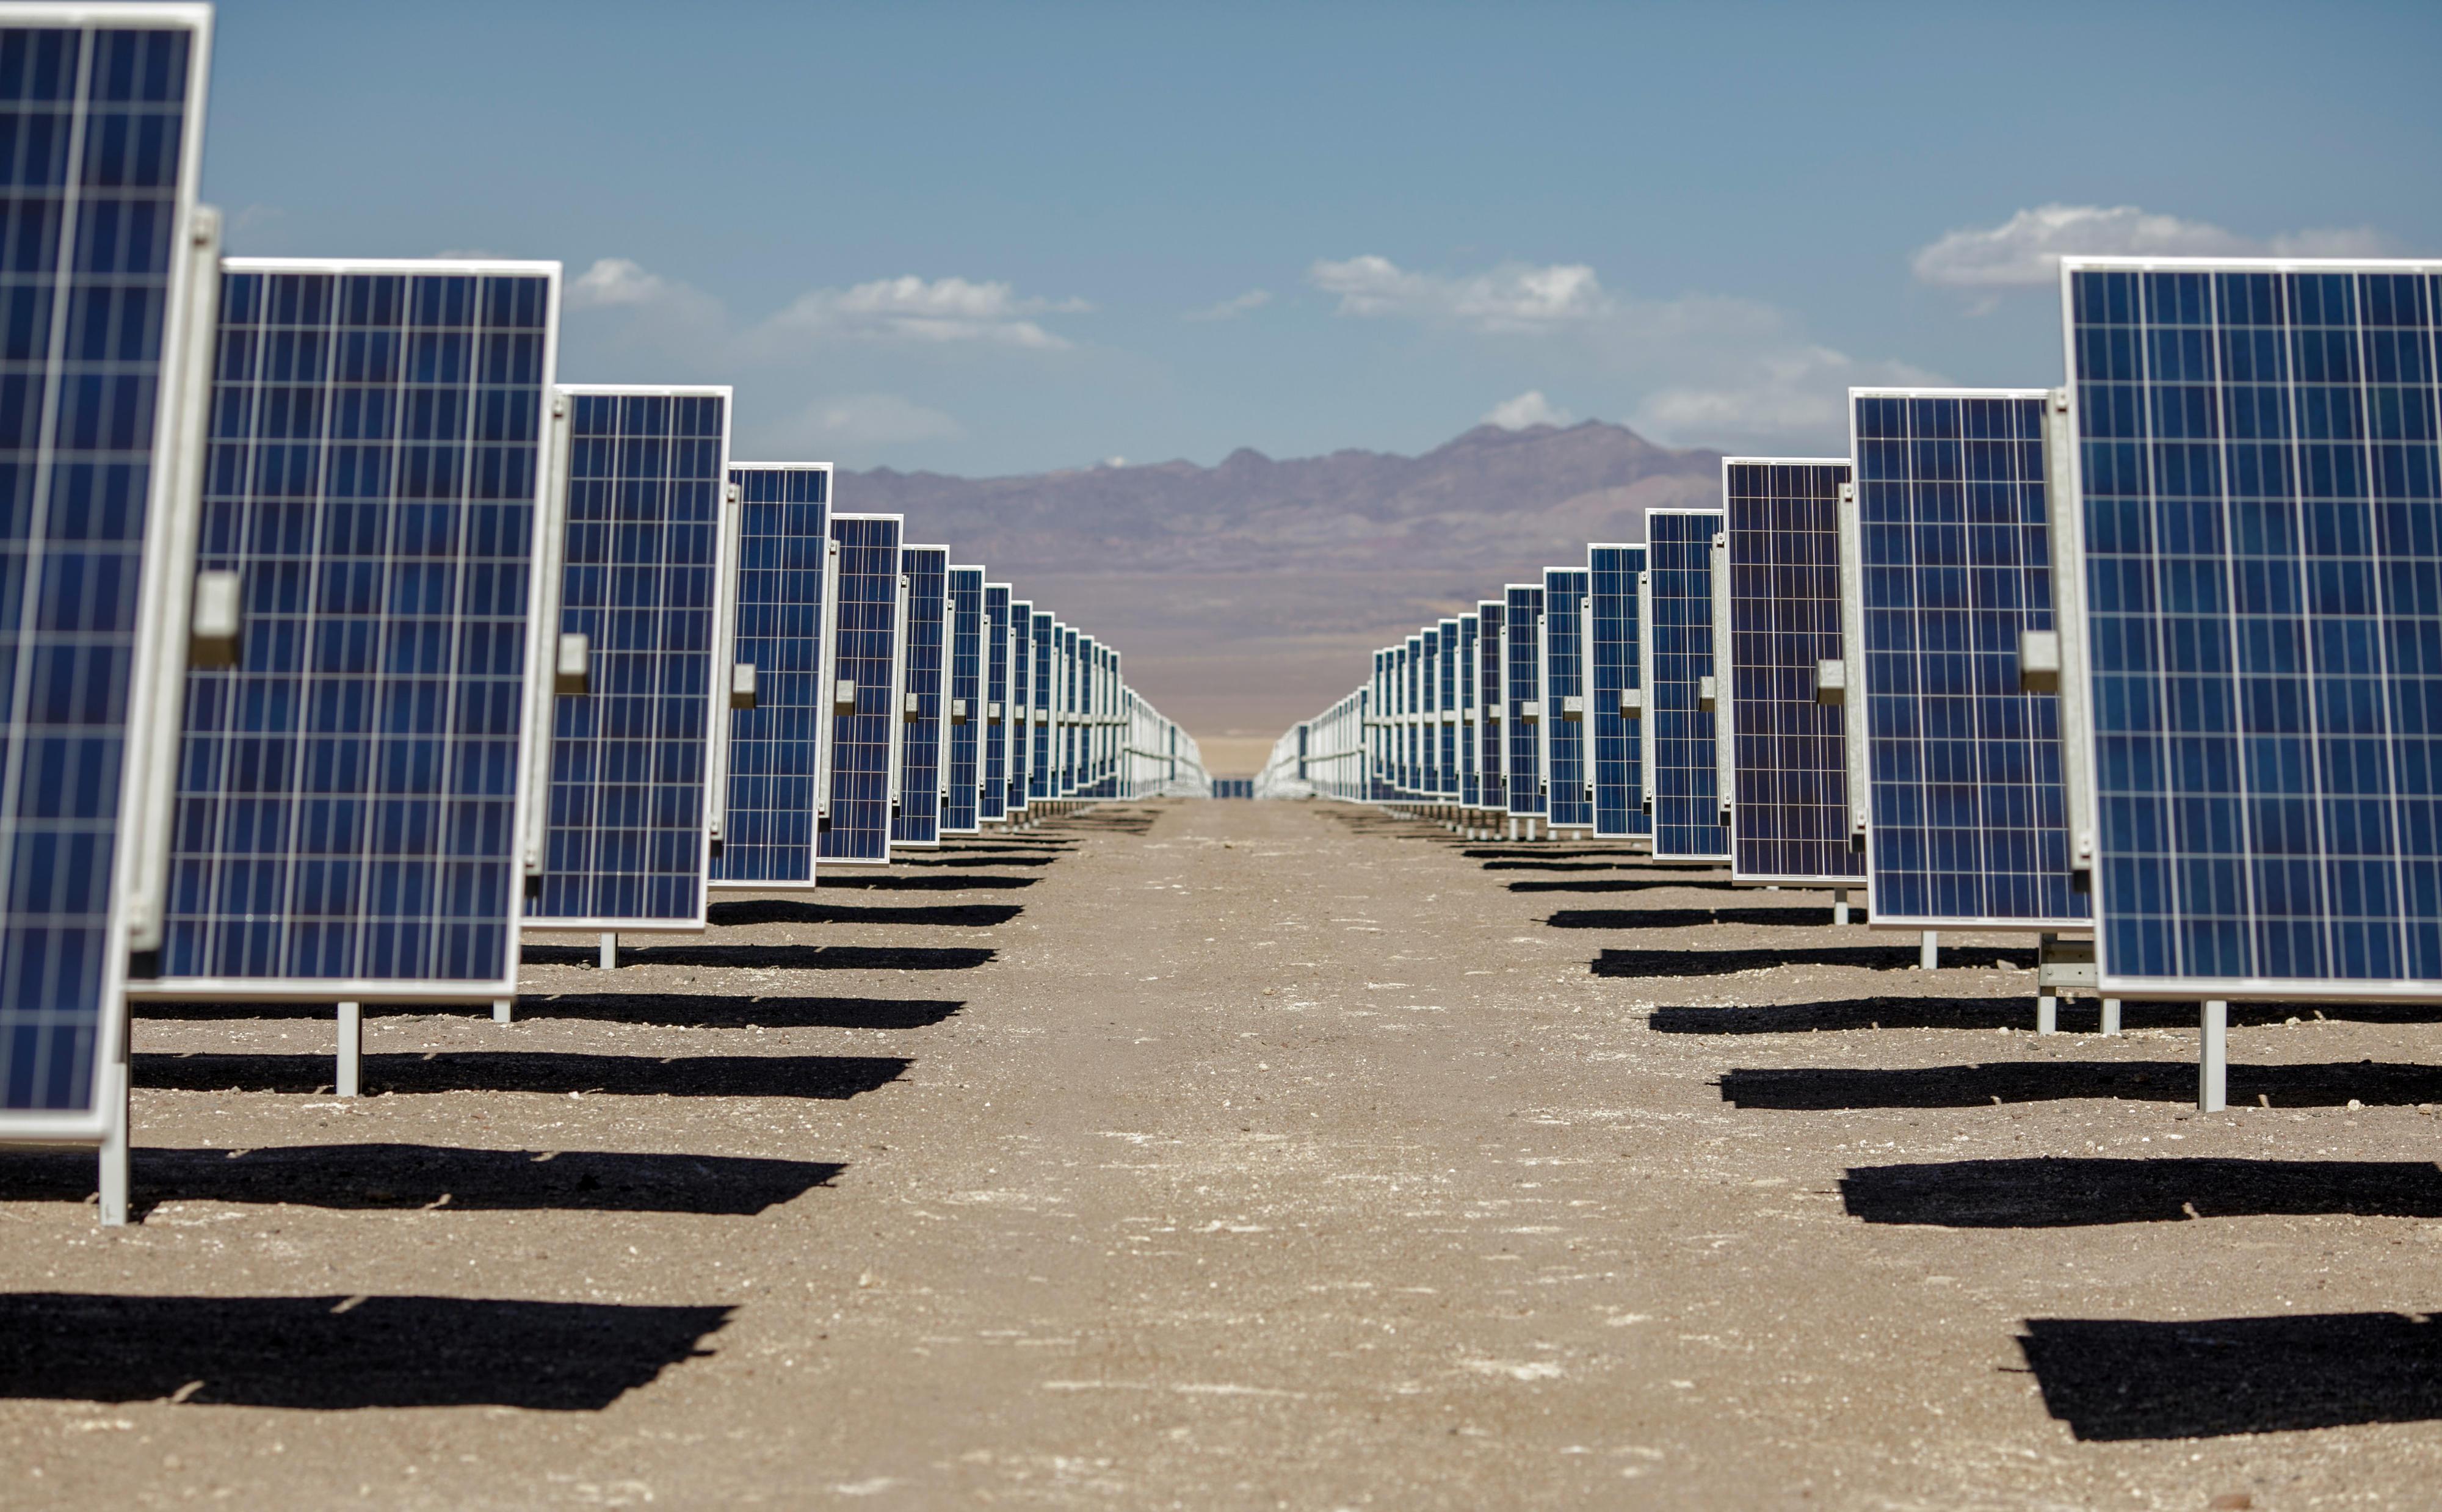 Solaranlage Solar Jama in der Atacama-Wüste in Chile